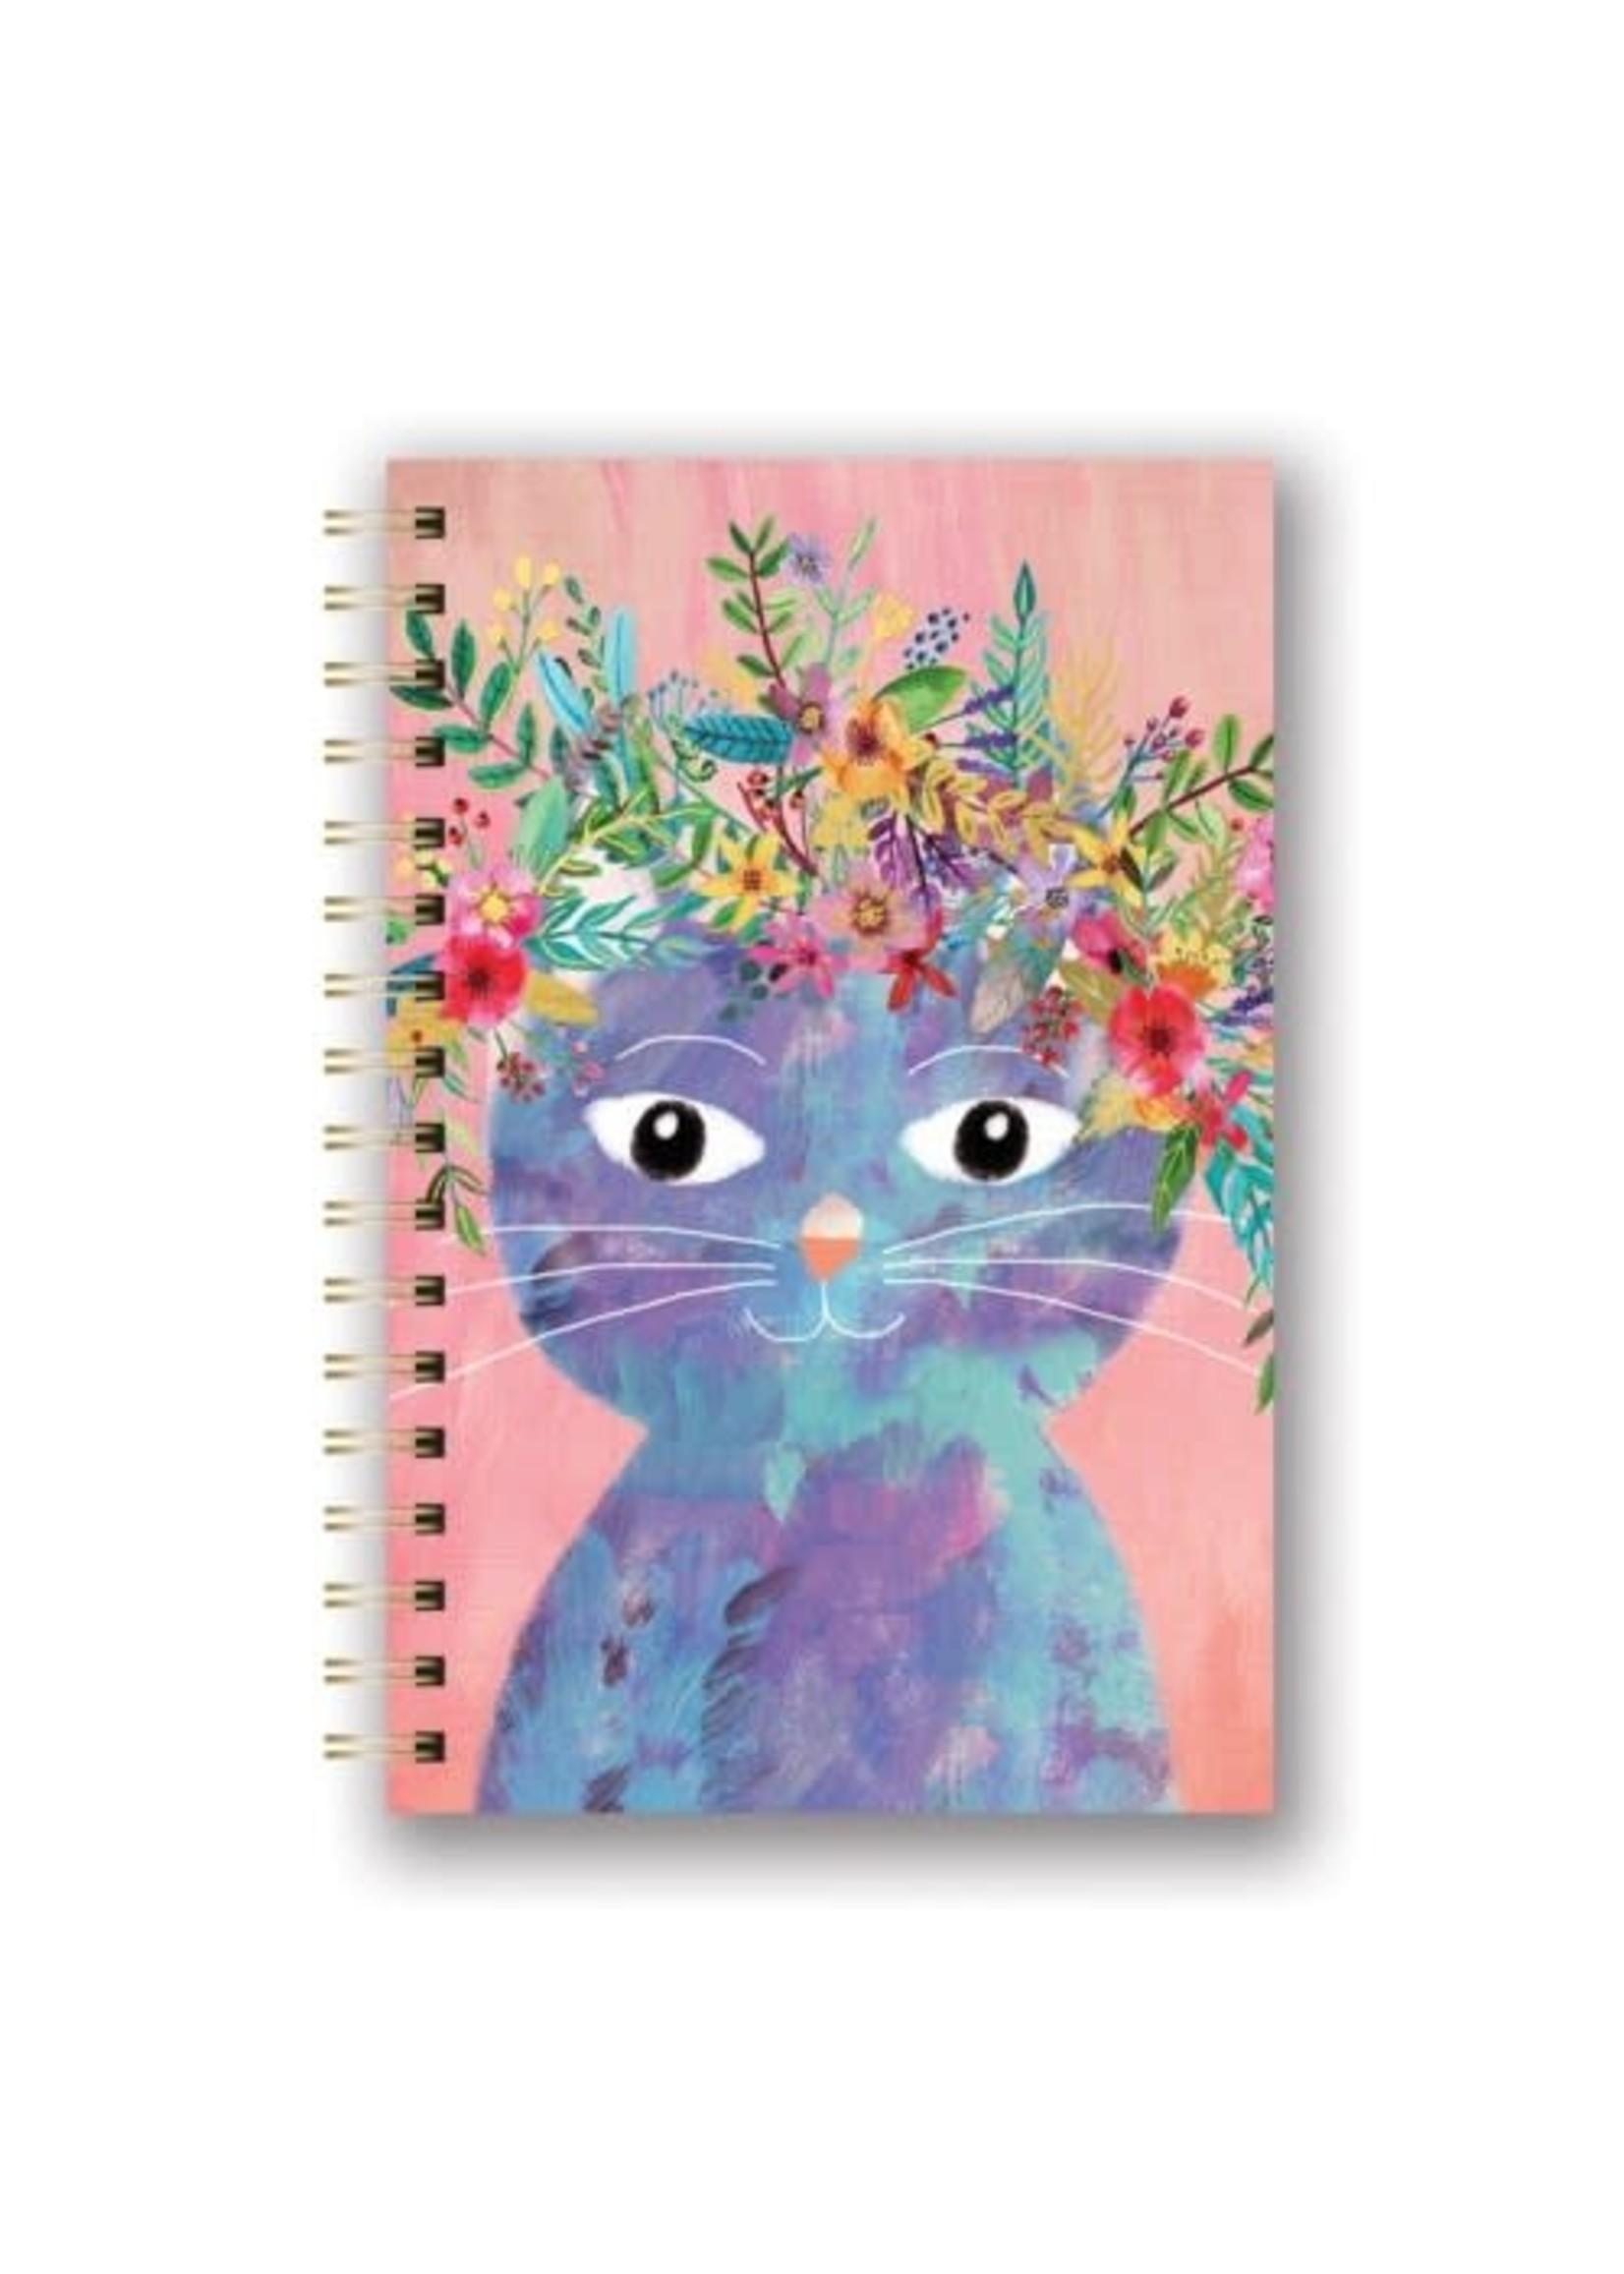 Studio Oh! Spiral Notebook Fancy Cat